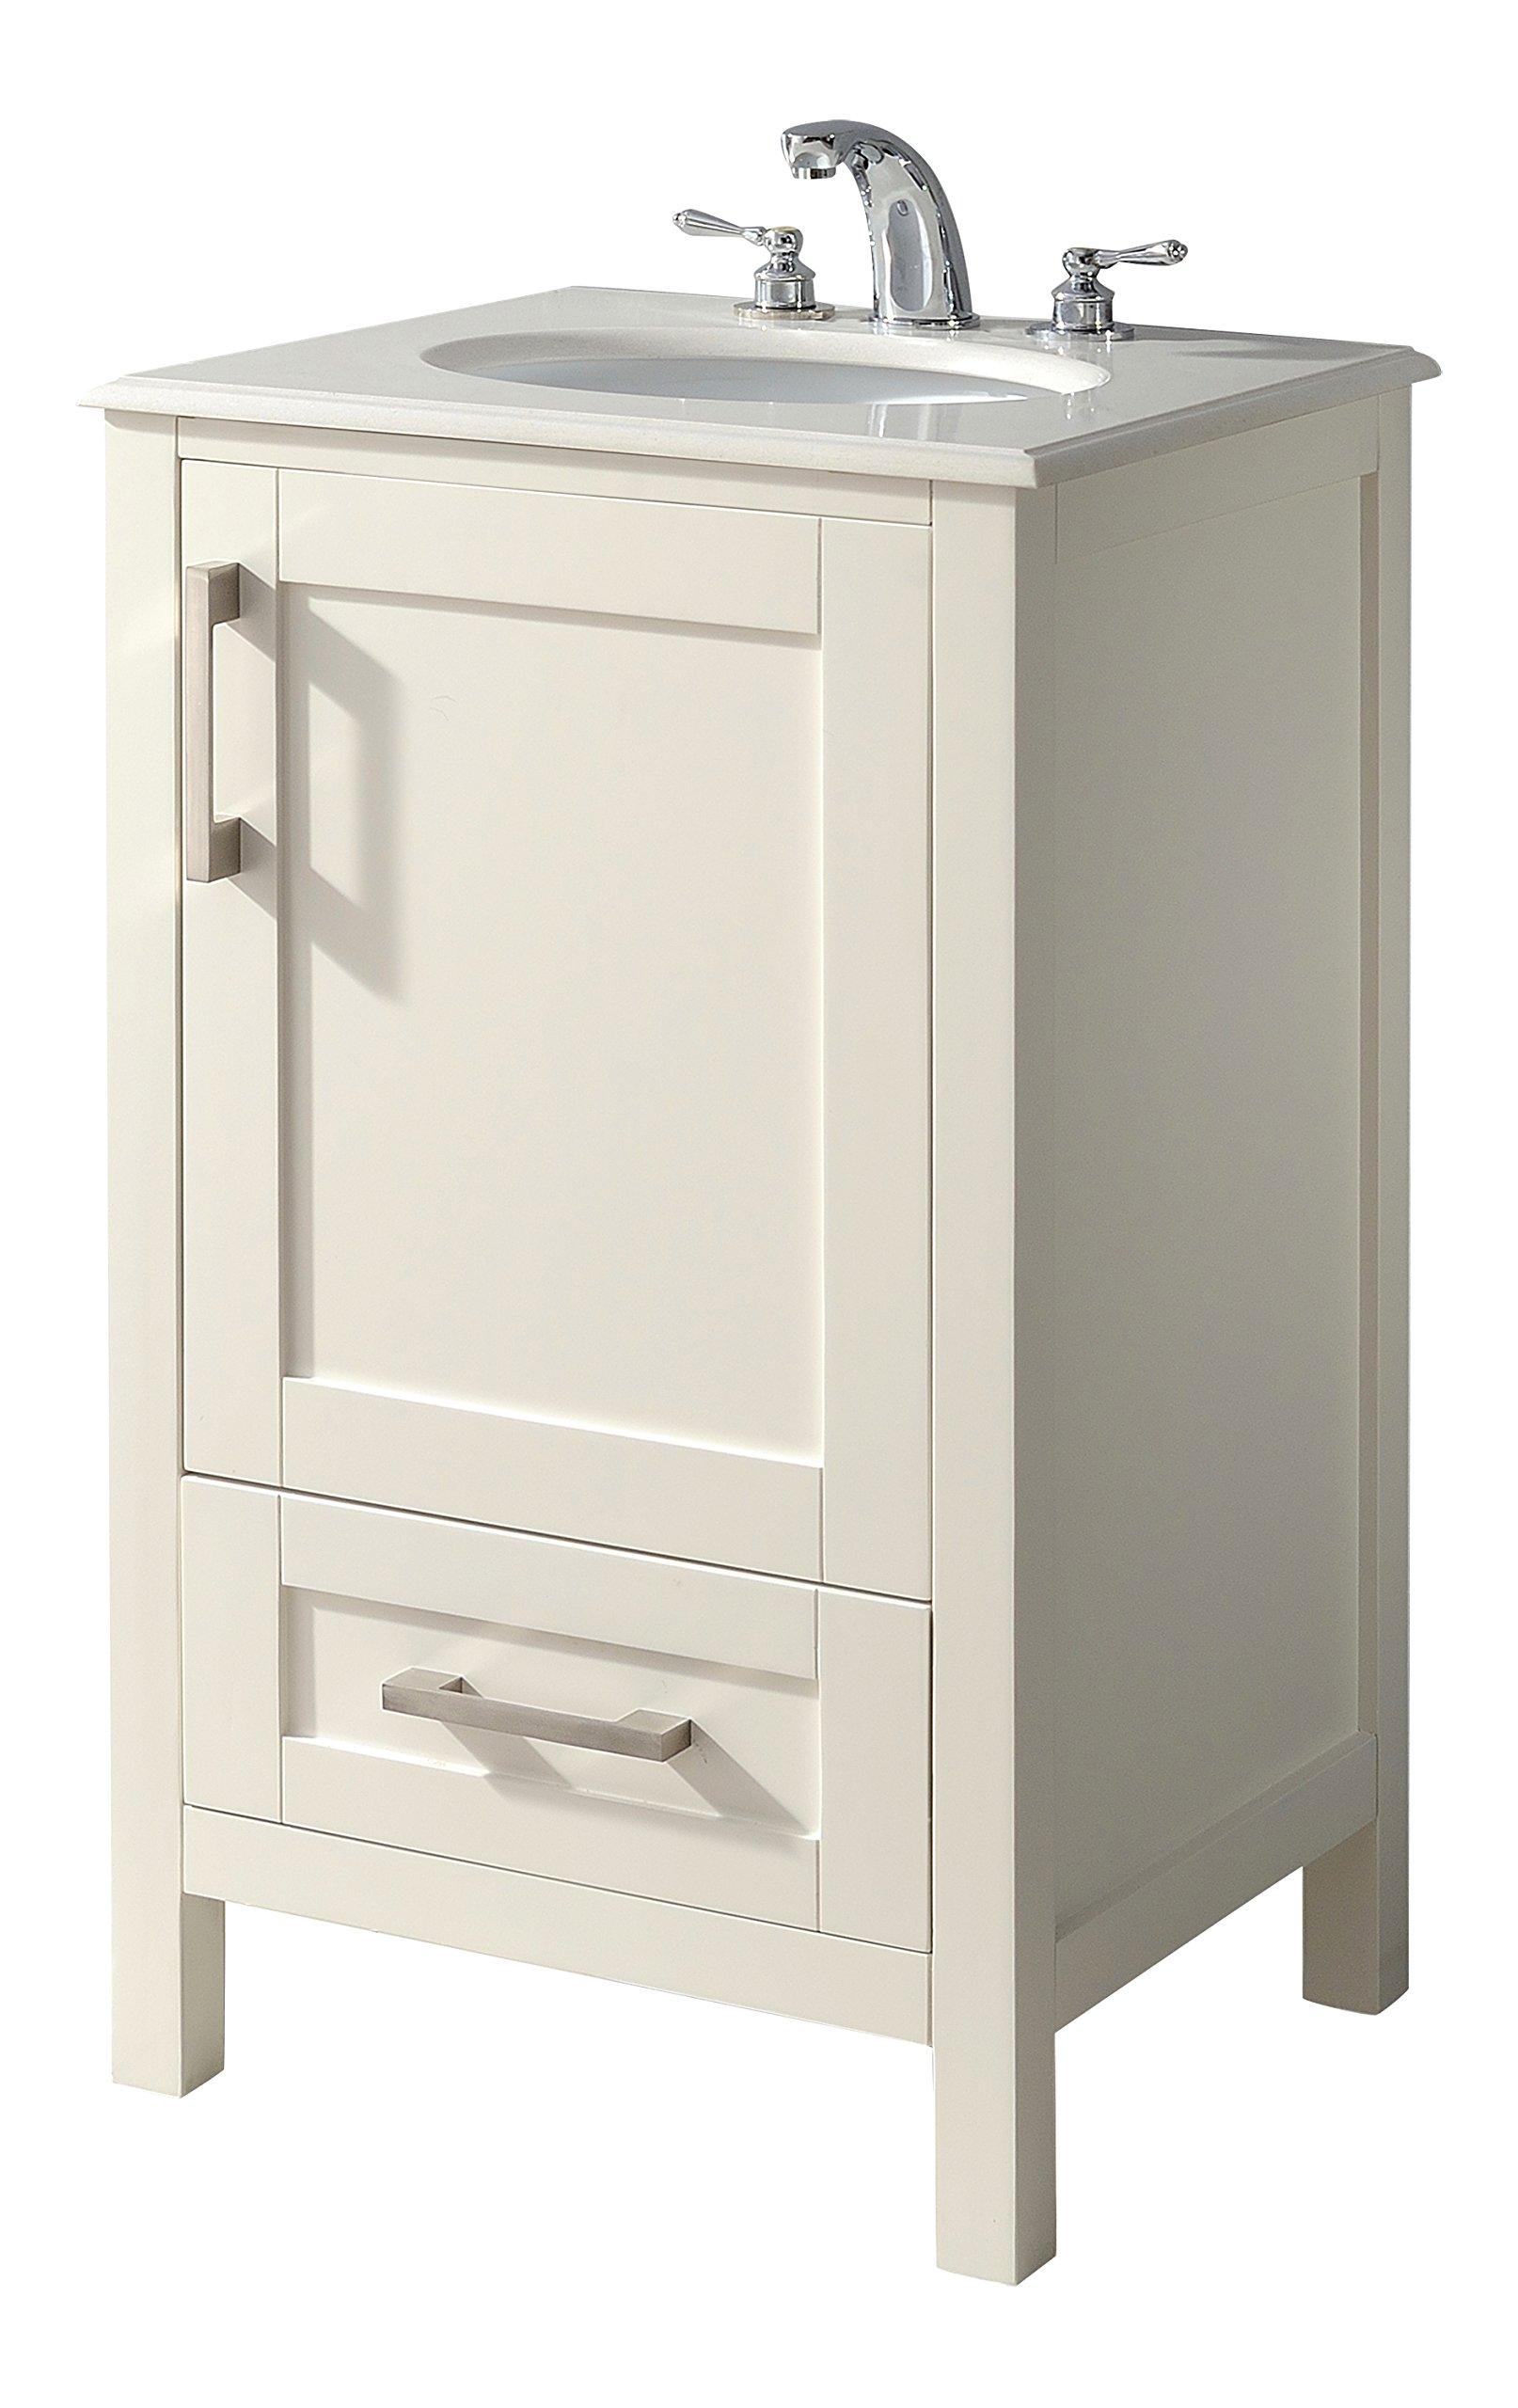 20 Inch Bathroom Vanity: Amazon.com